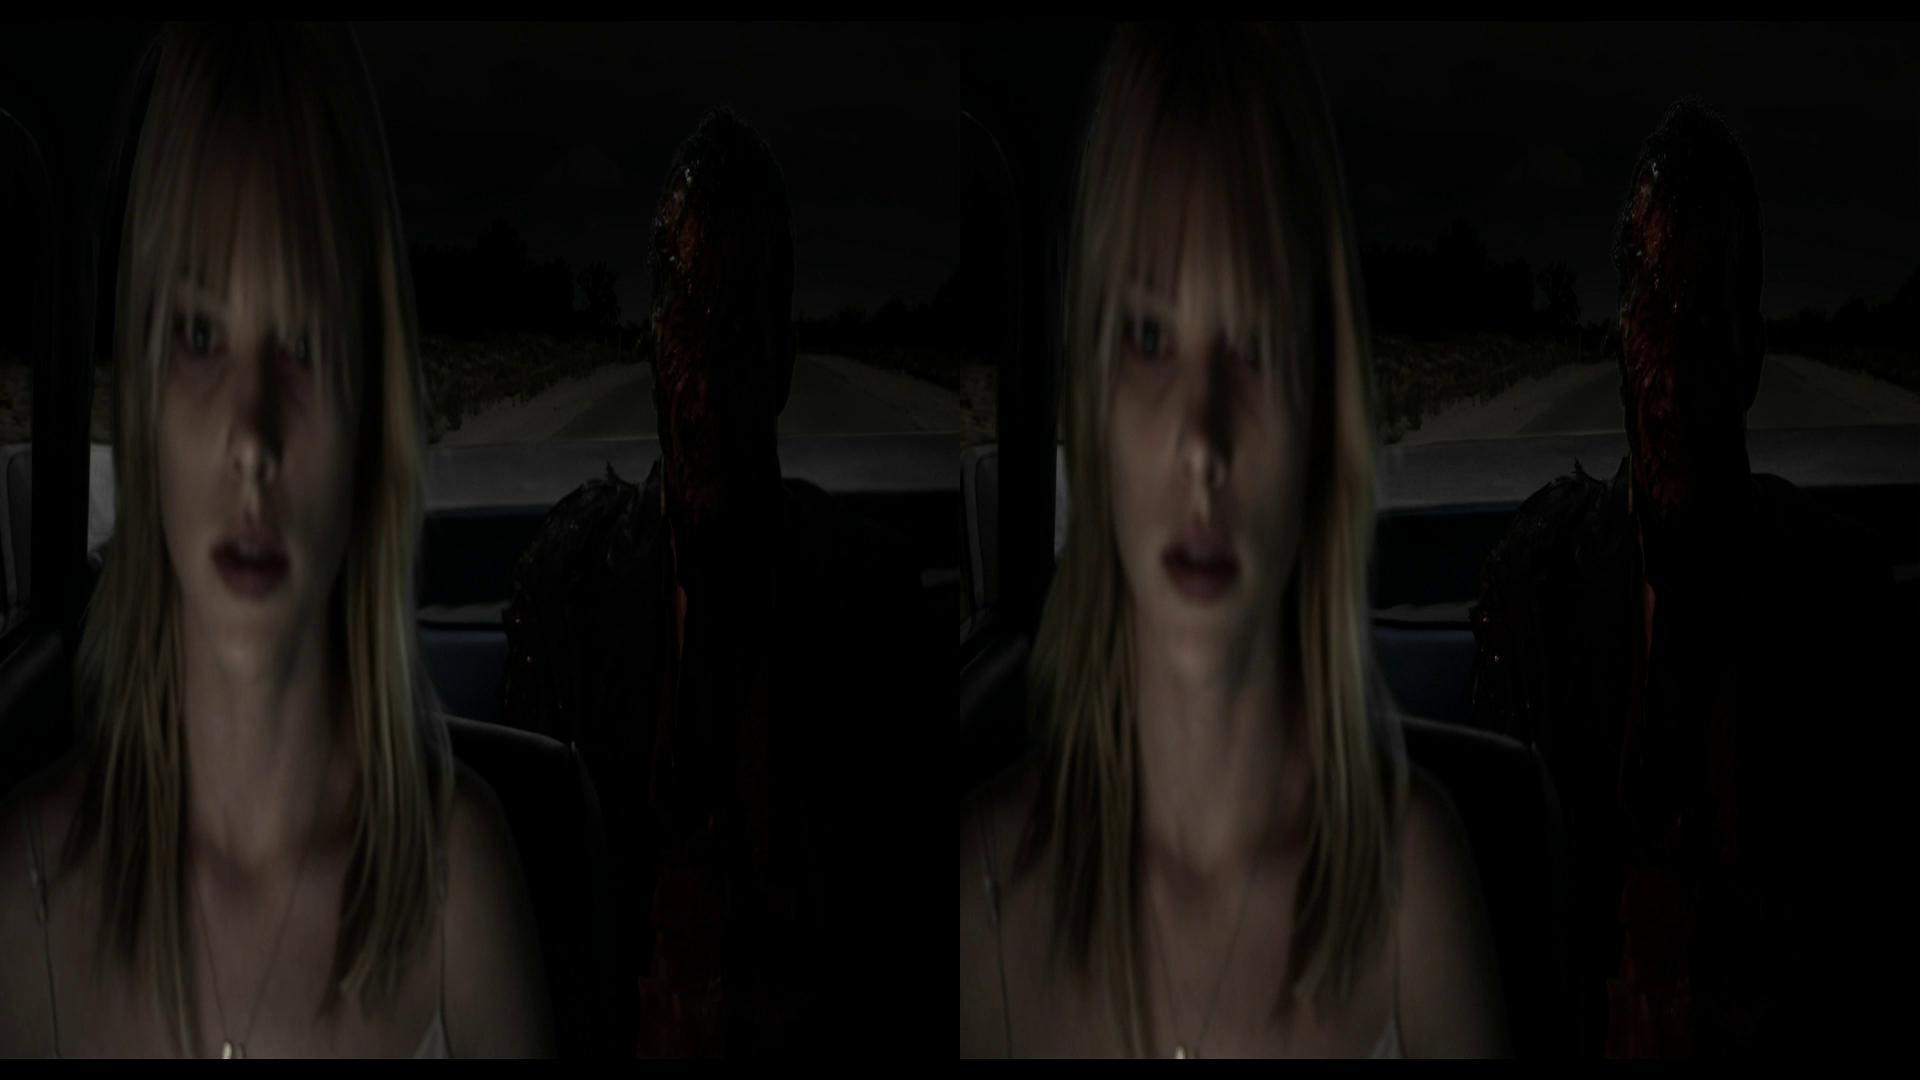 Karanlık Ülke - Dark Country 2009 3D (1080p BluRay H-SBS) DUAL TR-EN - 3D Fim indir